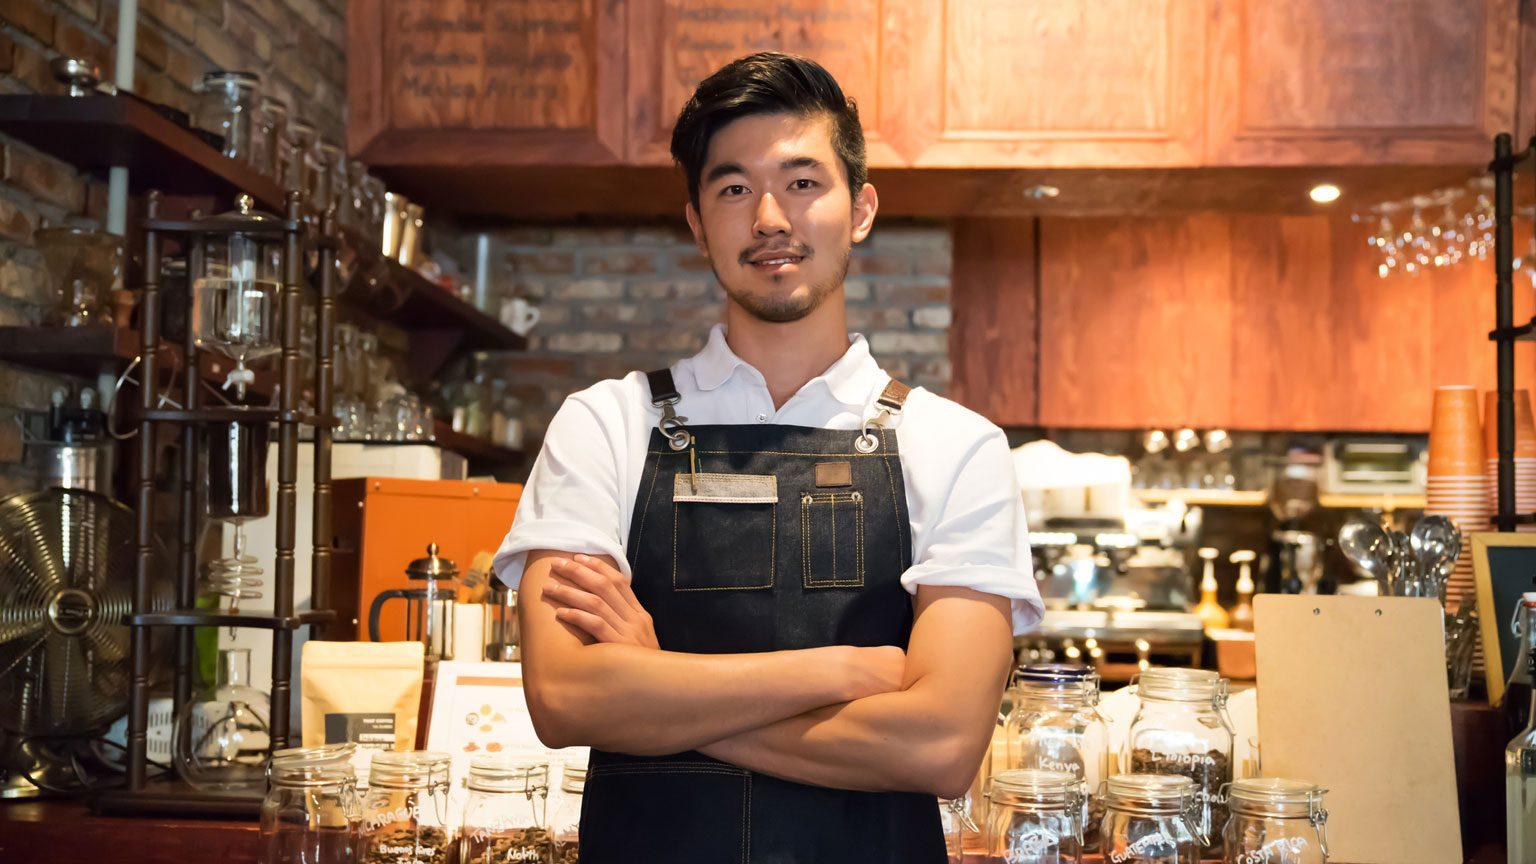 Cafe business owner